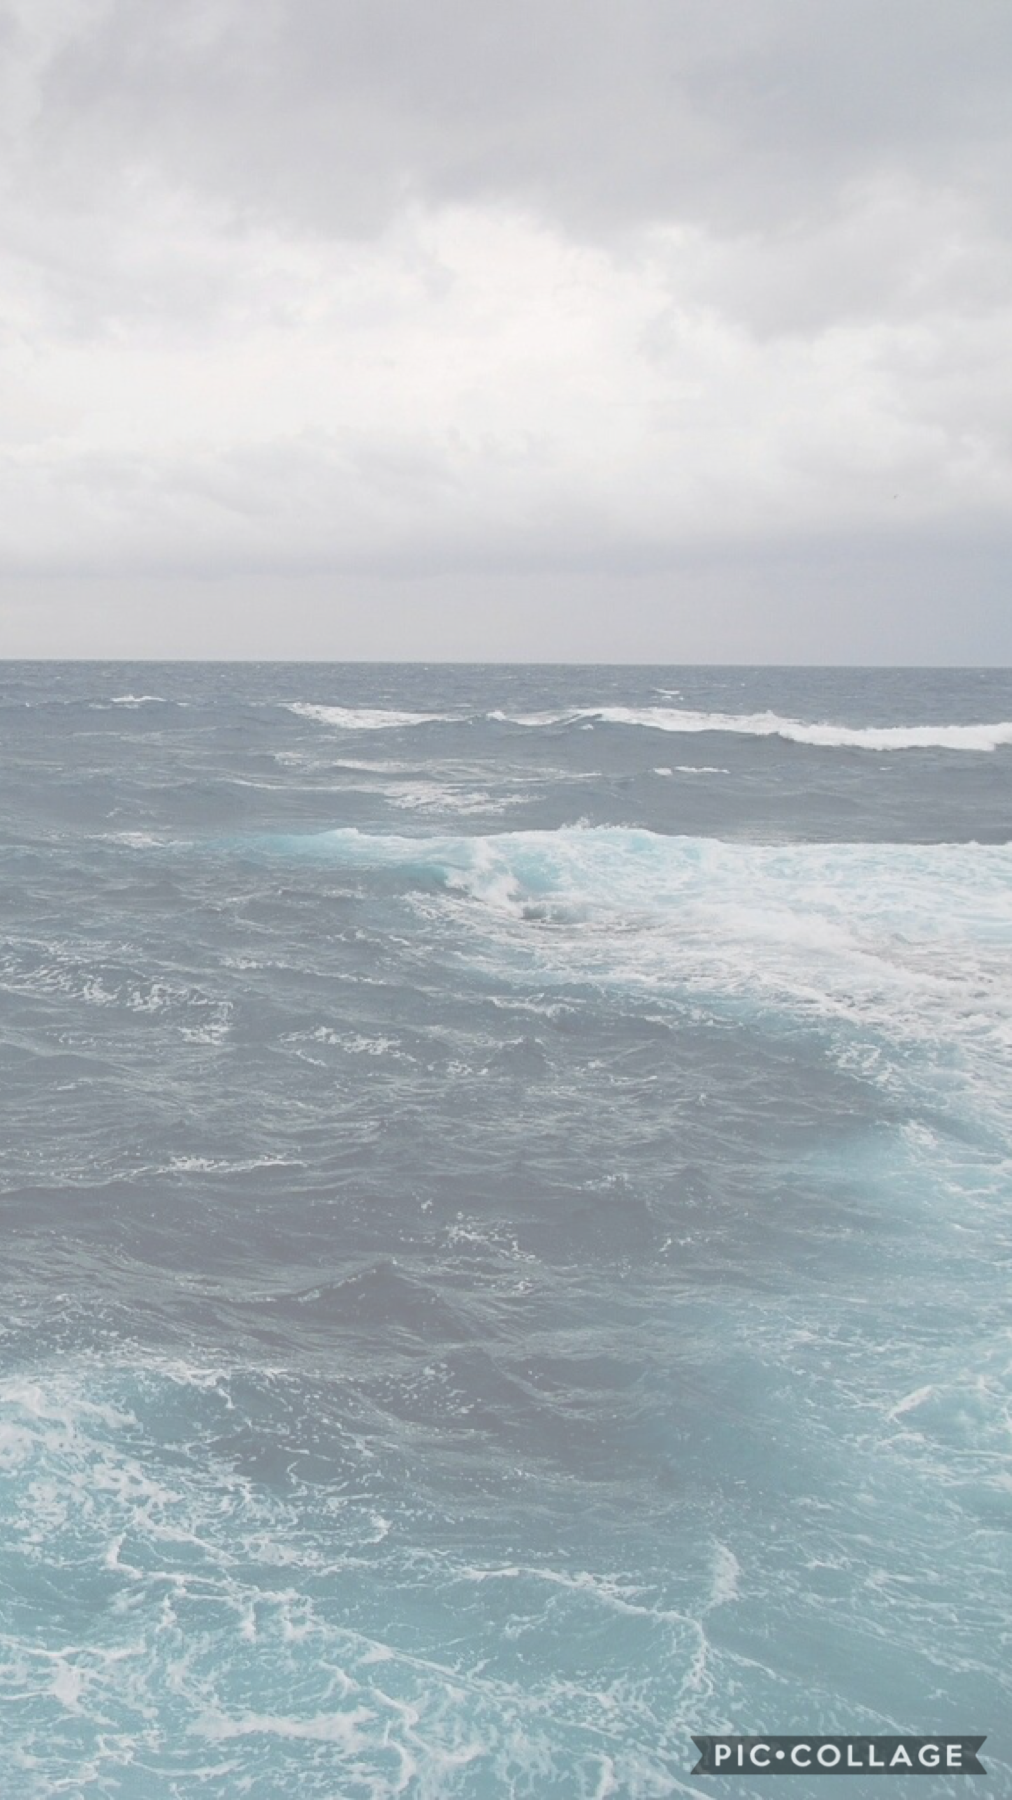 🌊 day one of ocean wallpaper 🌊